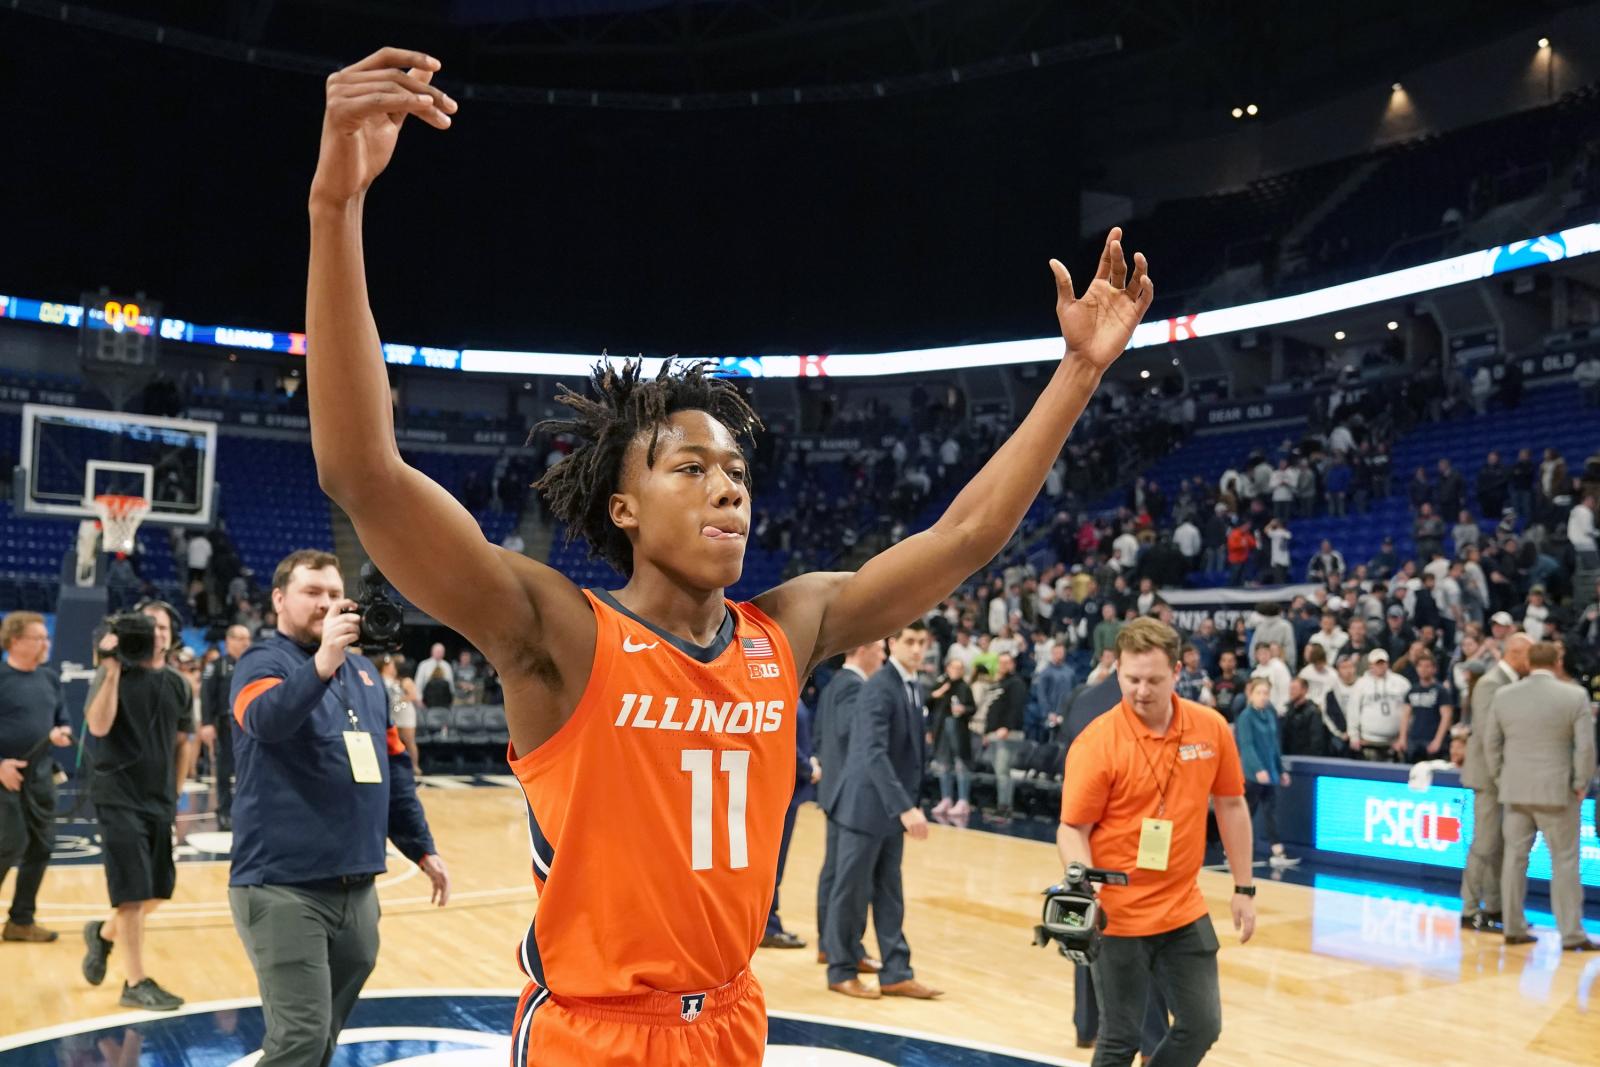 Illinois basketball: Illini MVP of the game against Penn State